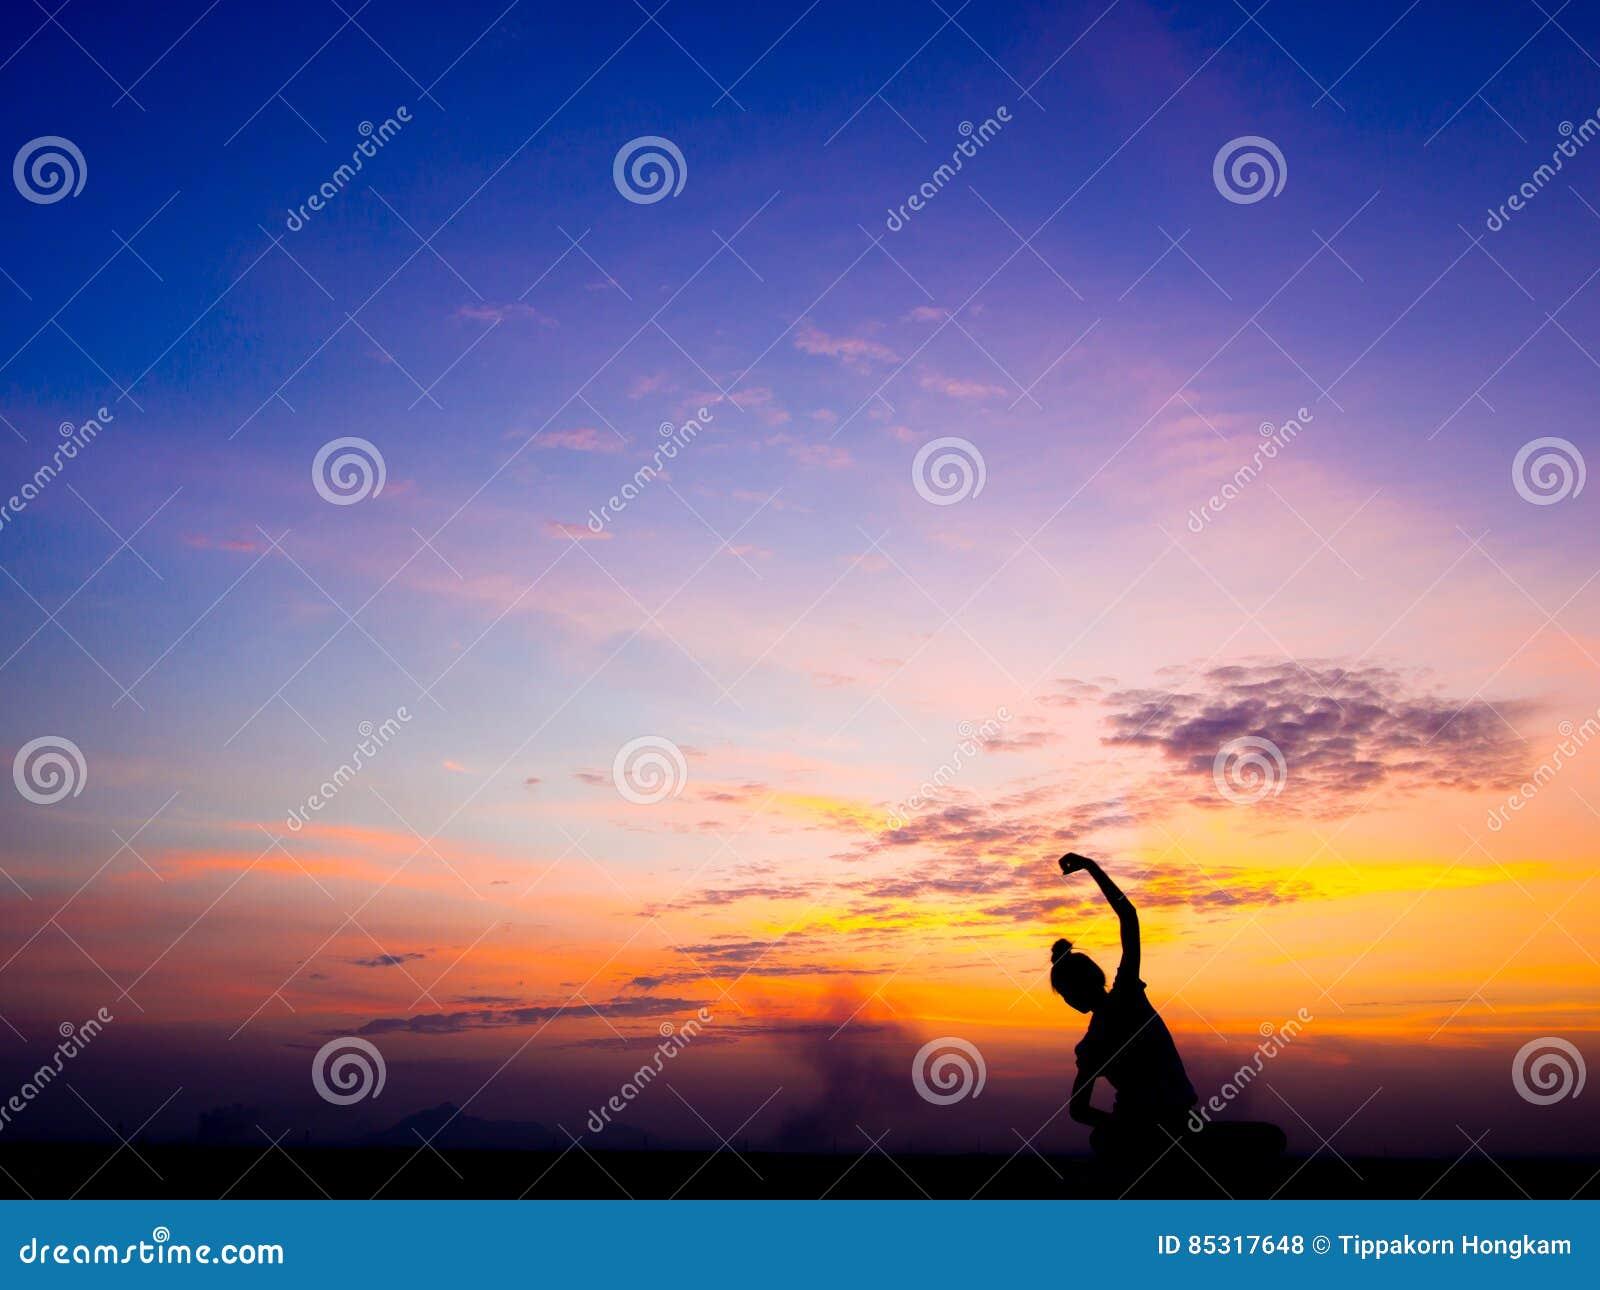 Йога и раздумье